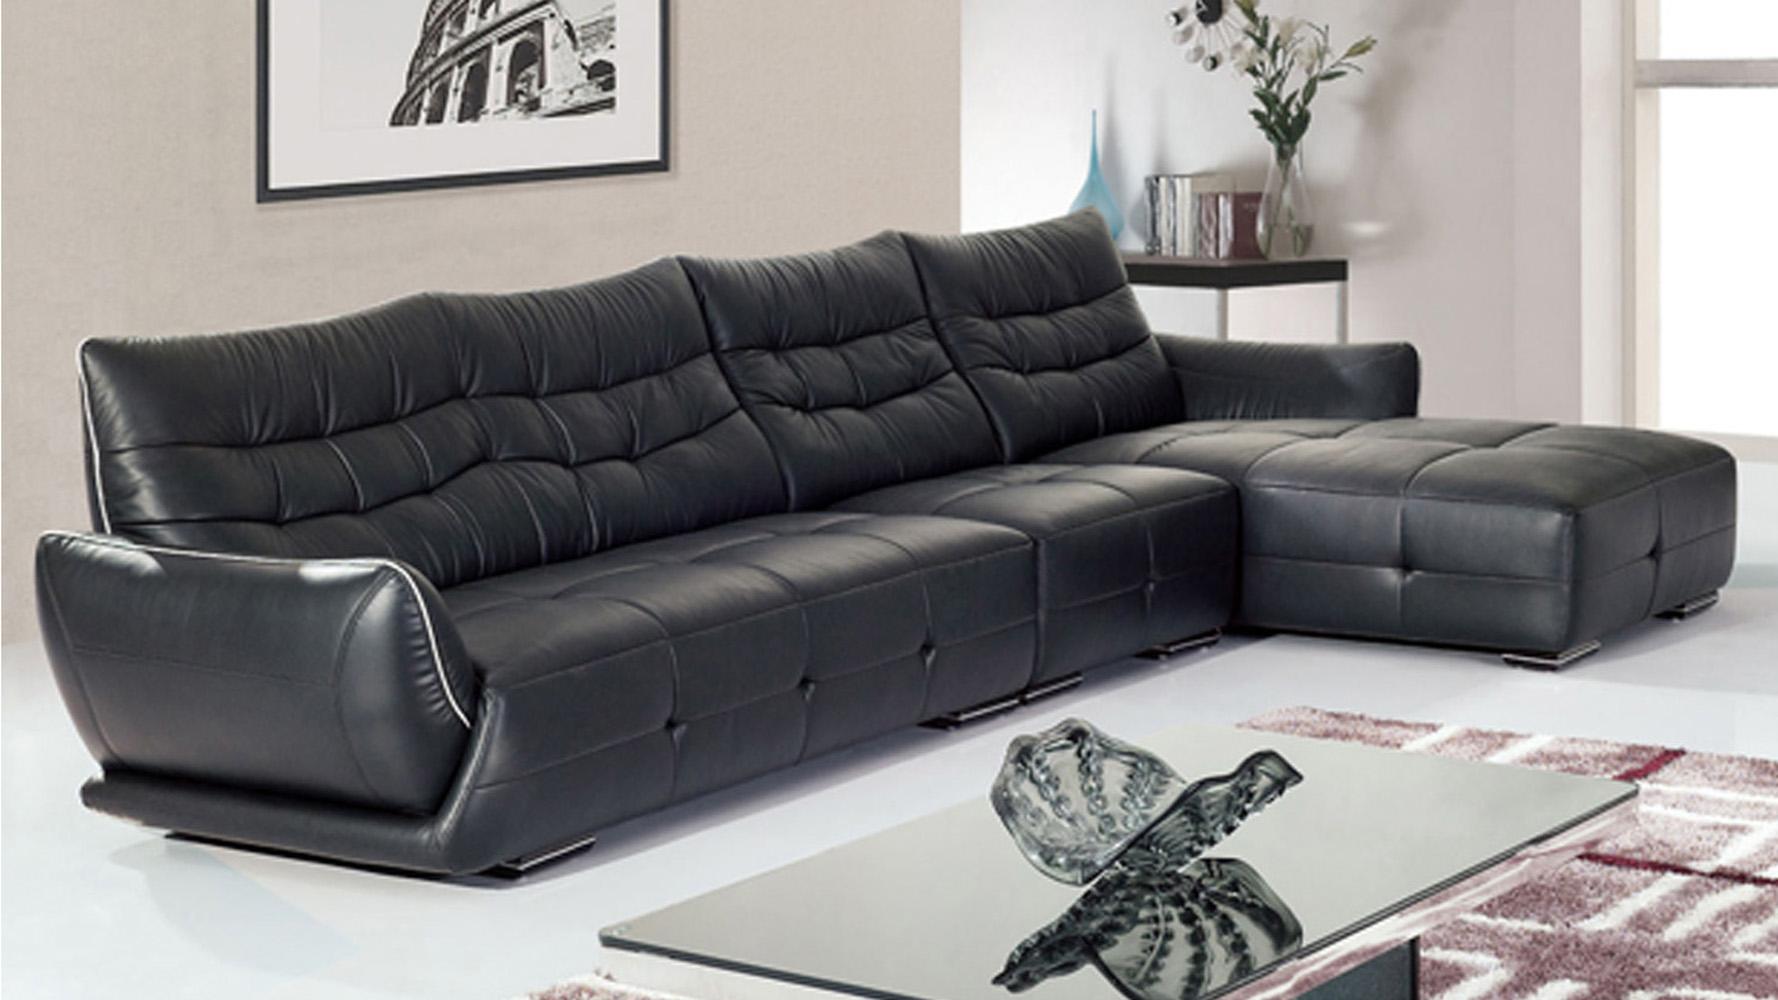 Chandler Dried Hardwood Frame Leather Sectional Sofa